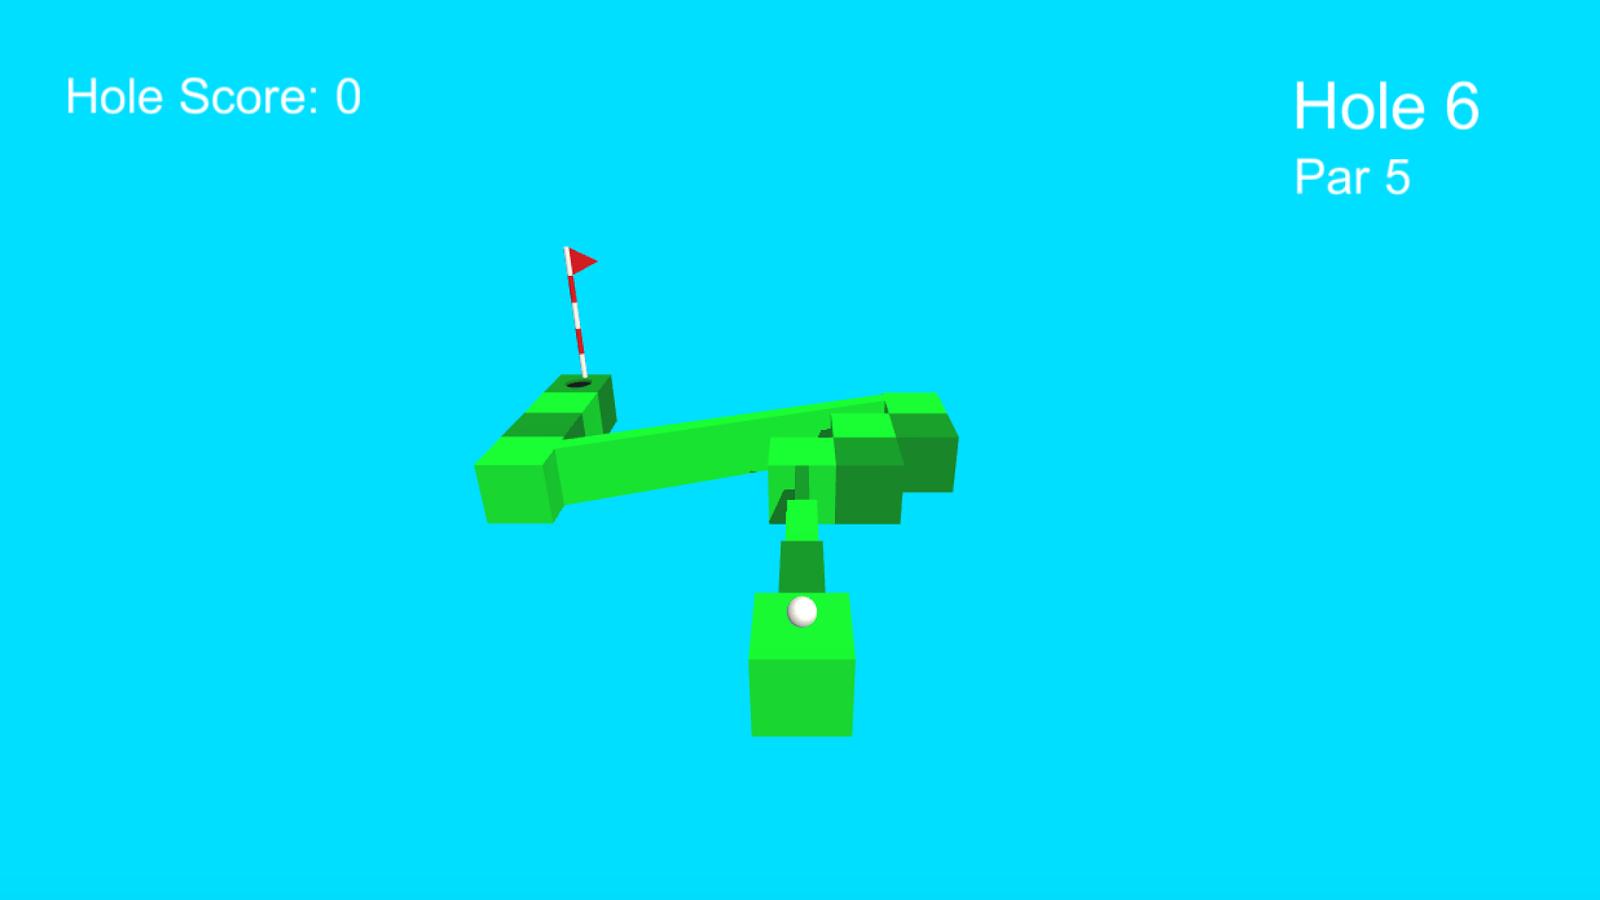 TipTap-Golf 14